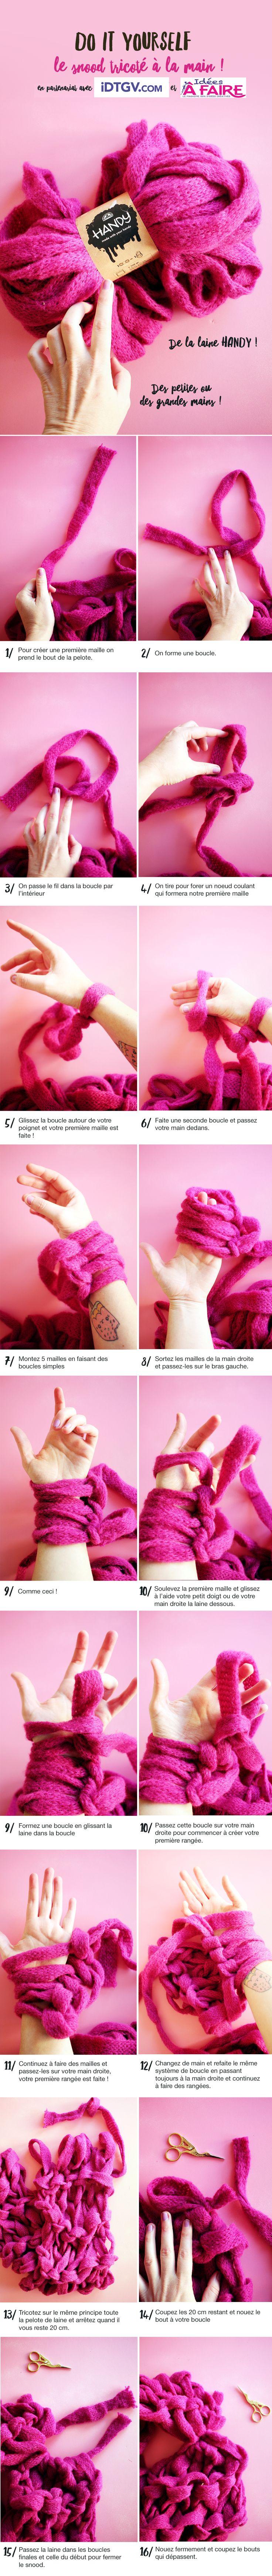 DIY snood avec les bras / yarn arm